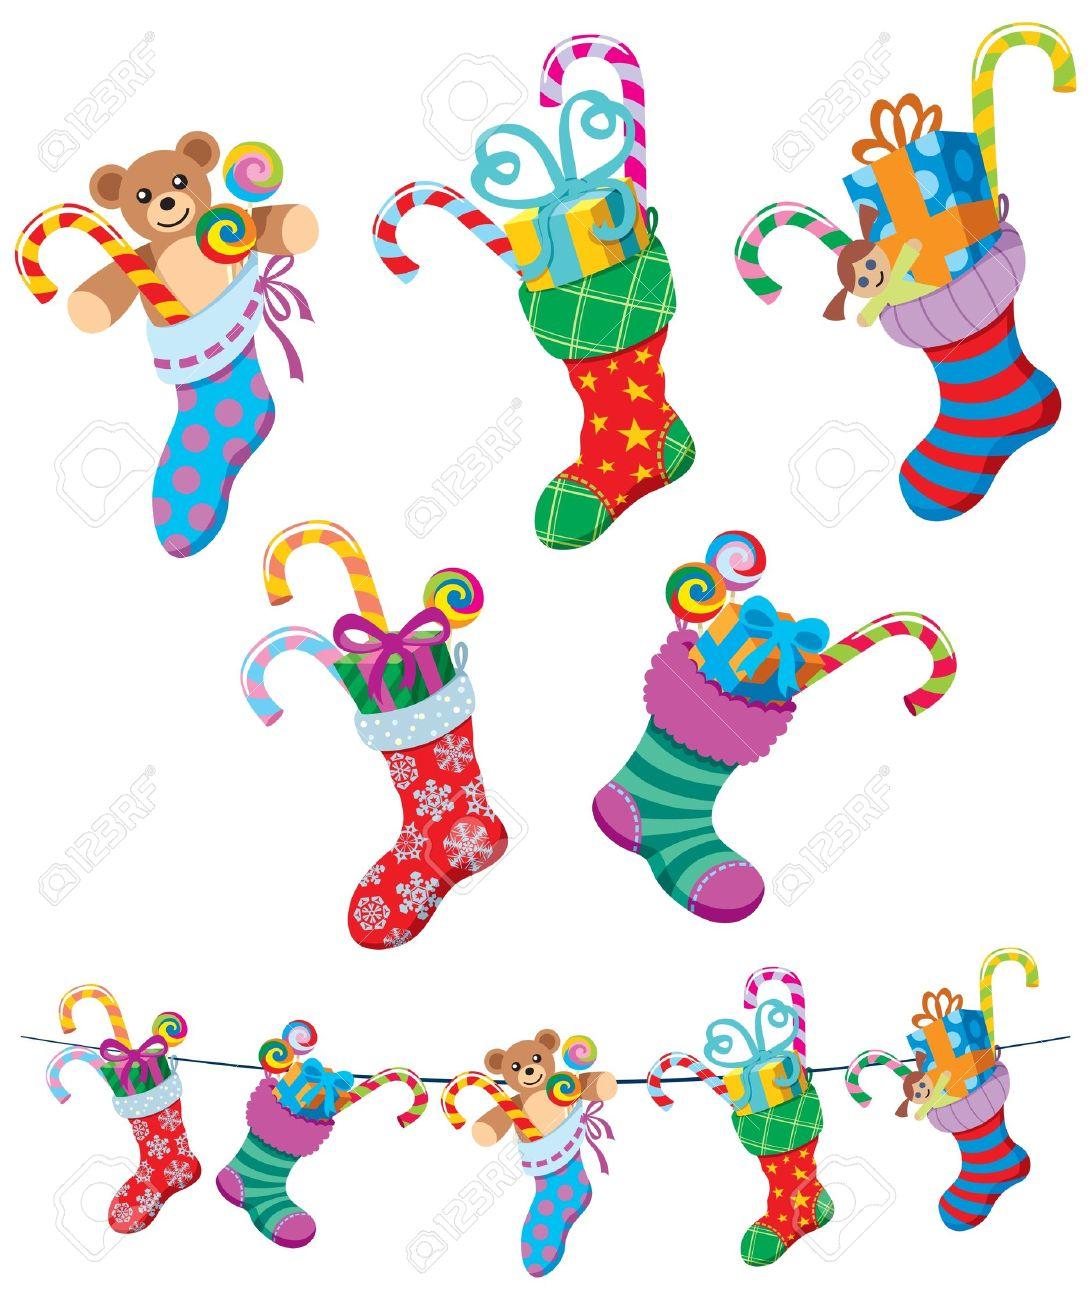 Christmas Stockings Cartoon.5 Cartoon Christmas Stockings Over White Background No Transparency